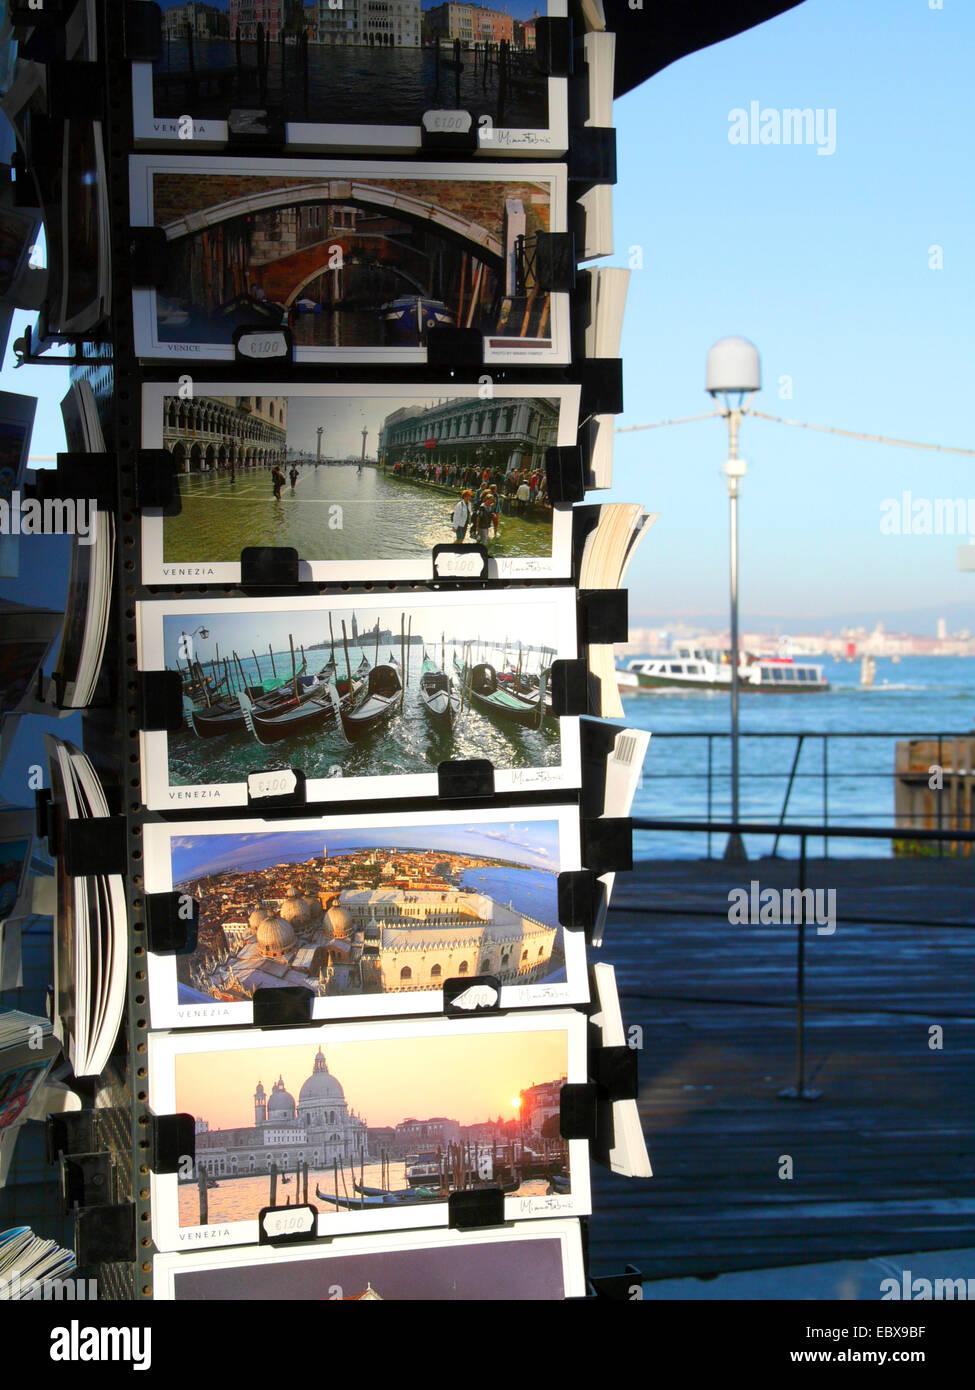 Lido di Venezia, souvenir booth with postcards, Italy, Venice - Stock Image